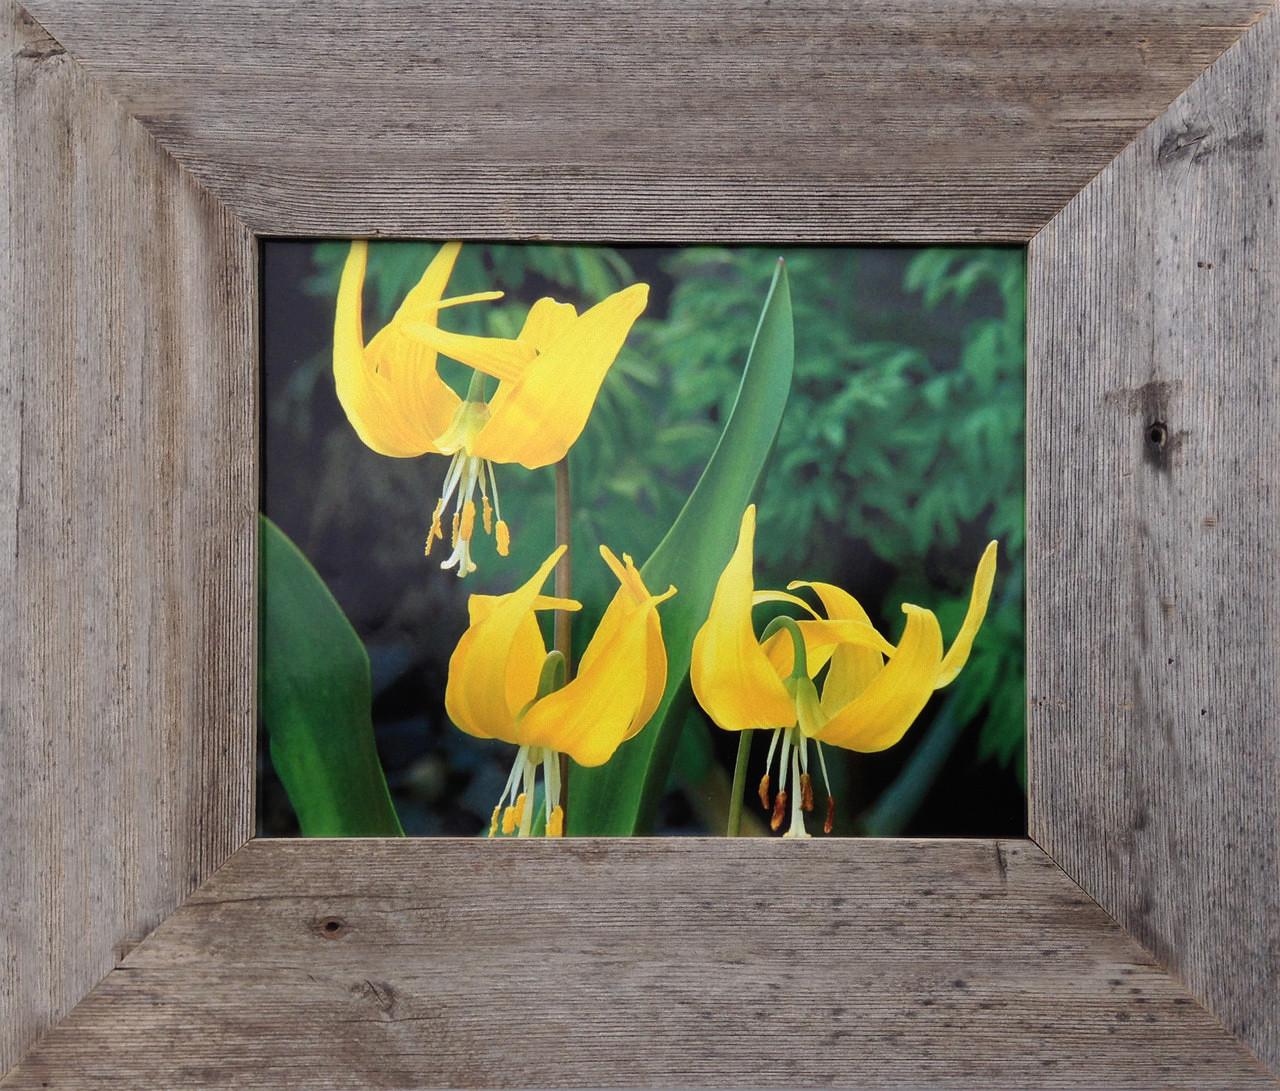 8x20 Barn Wood Frames, Wide Width 3 inch Homestead Series